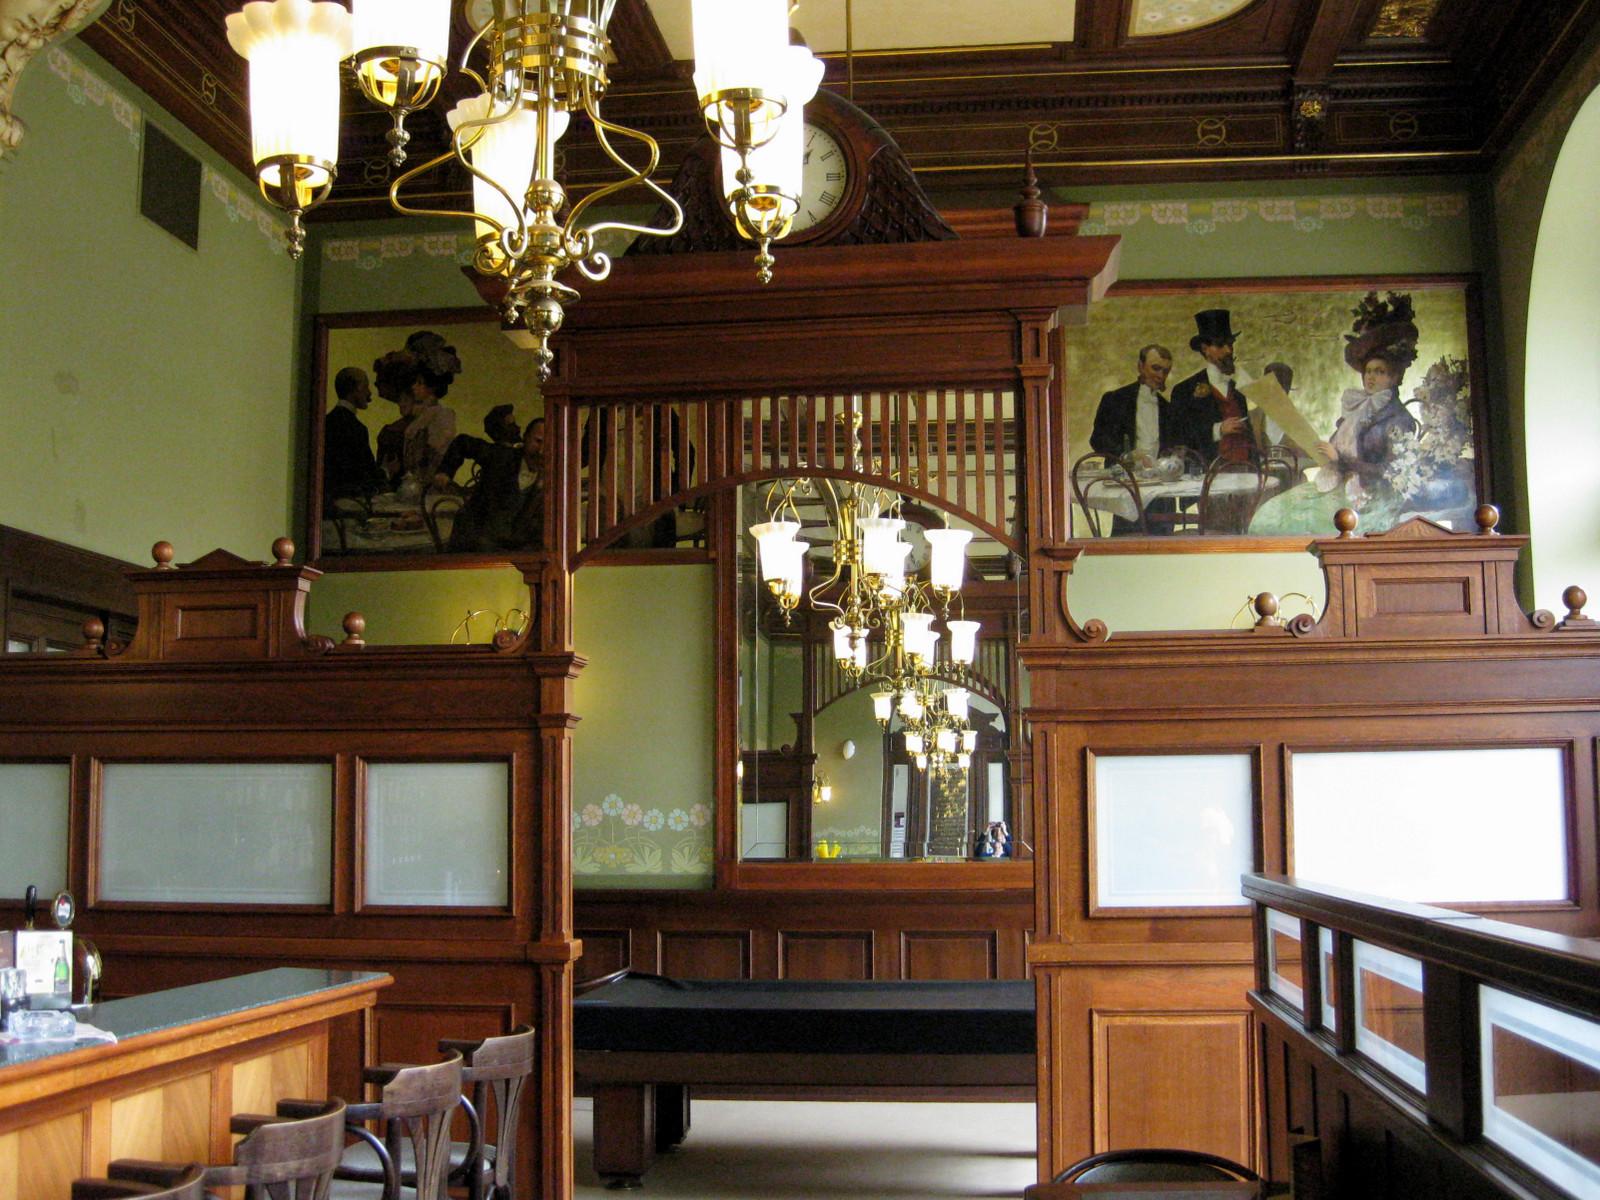 Bürger- und Vereinshaus - Café in Pilsen